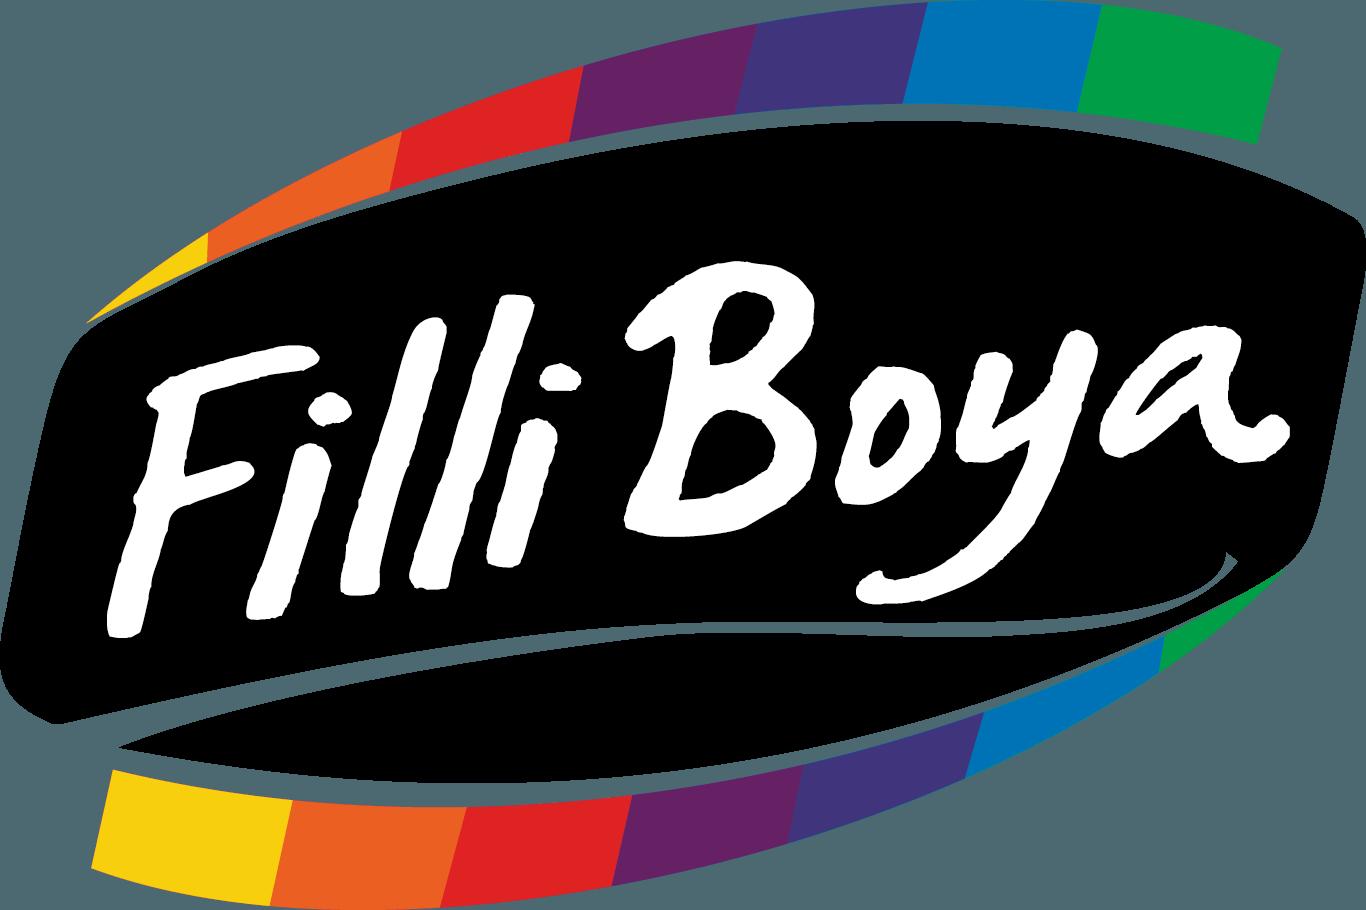 Filli Boya Logo png